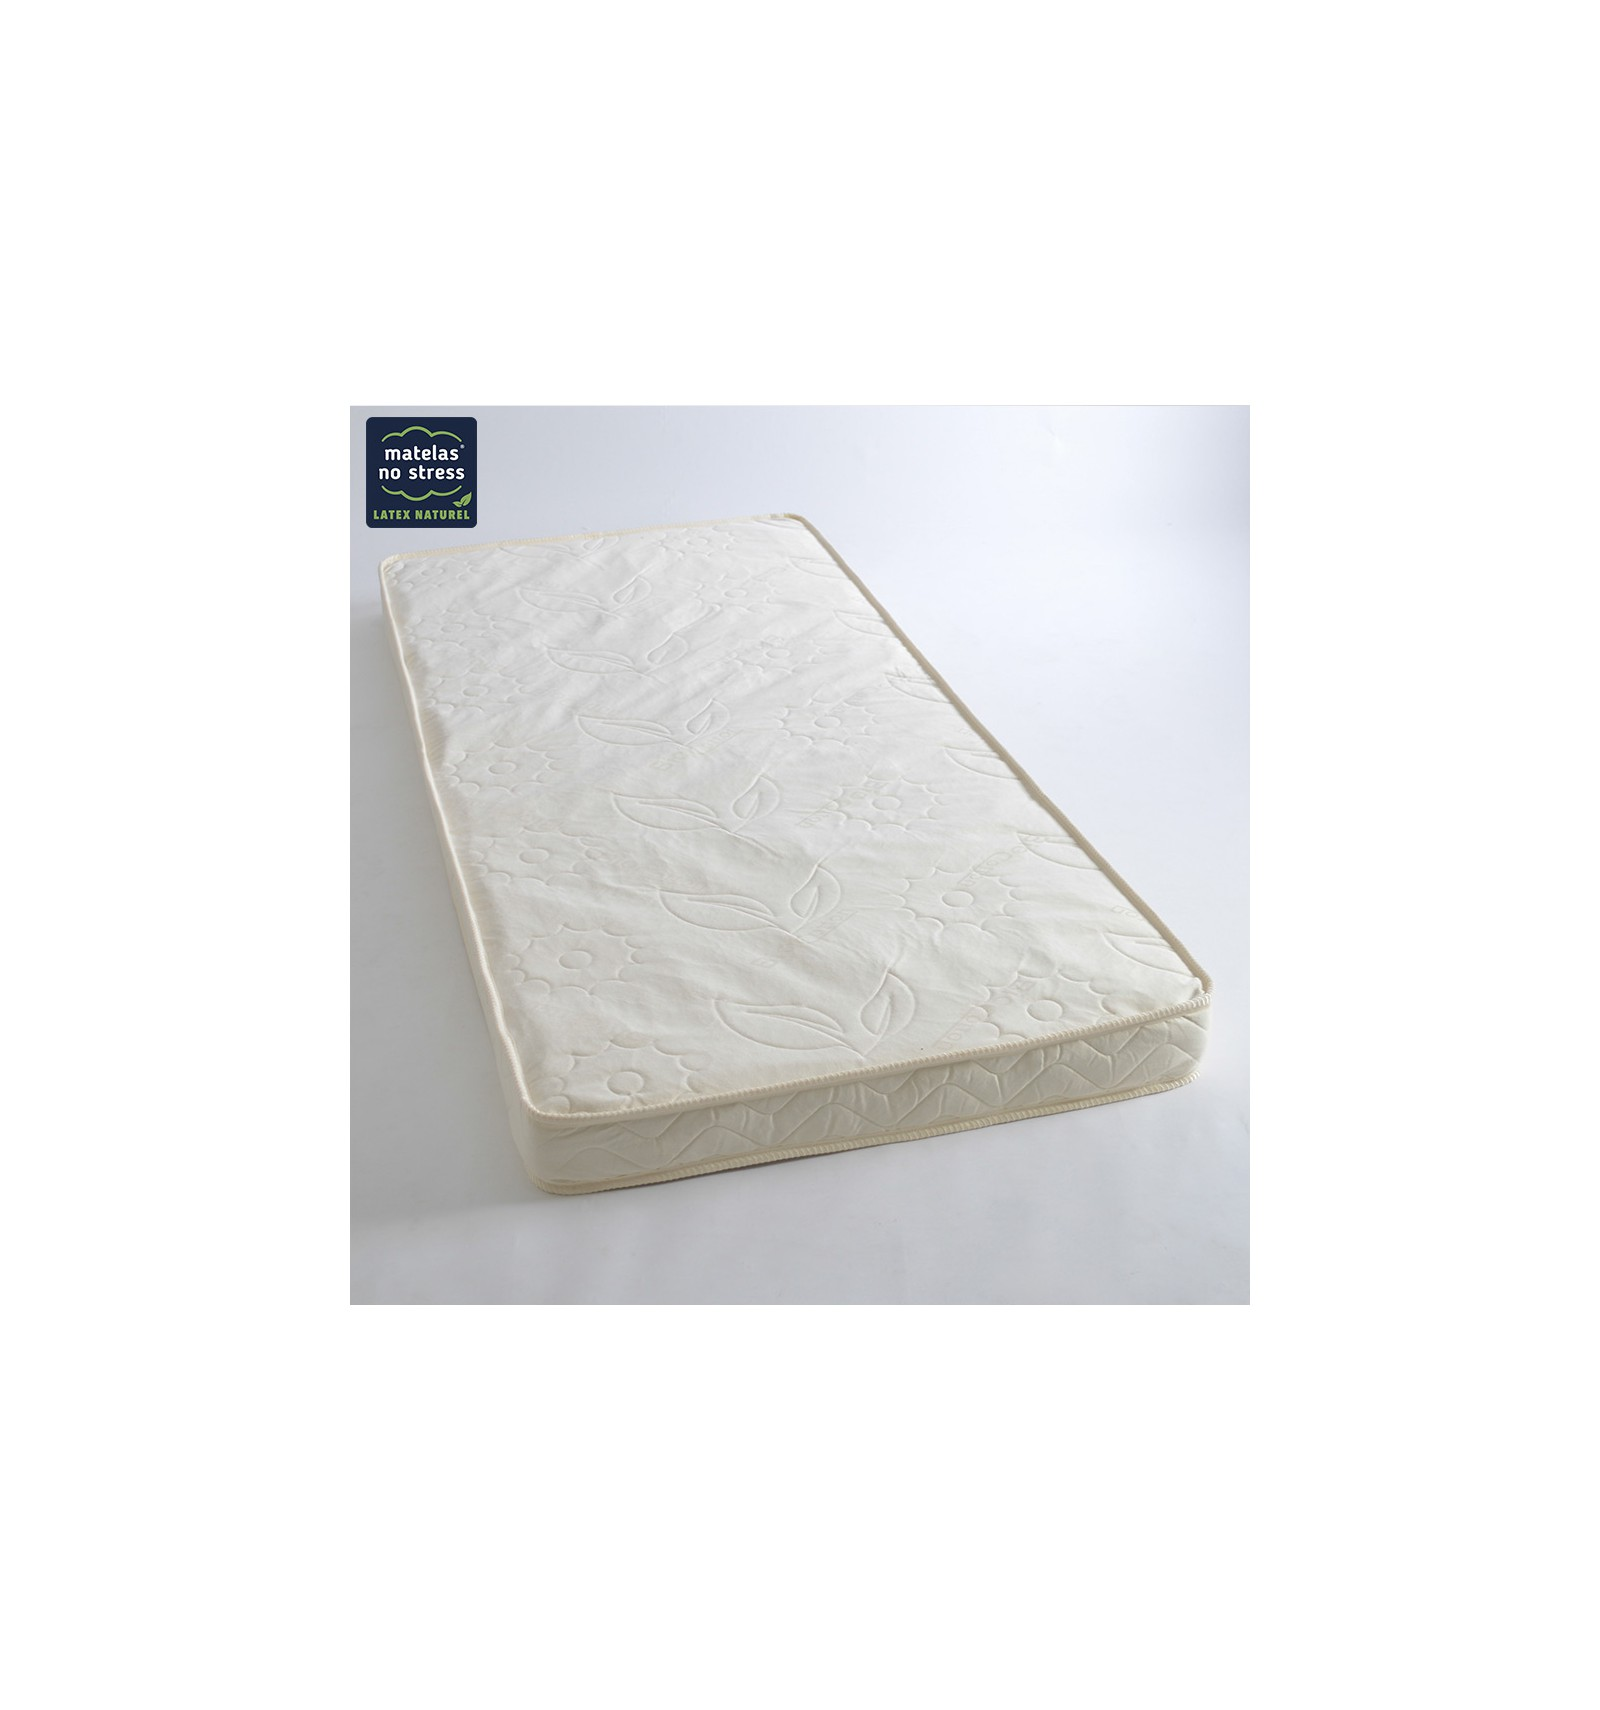 matelas 90x140 double face enveloppe laine bio couffin. Black Bedroom Furniture Sets. Home Design Ideas